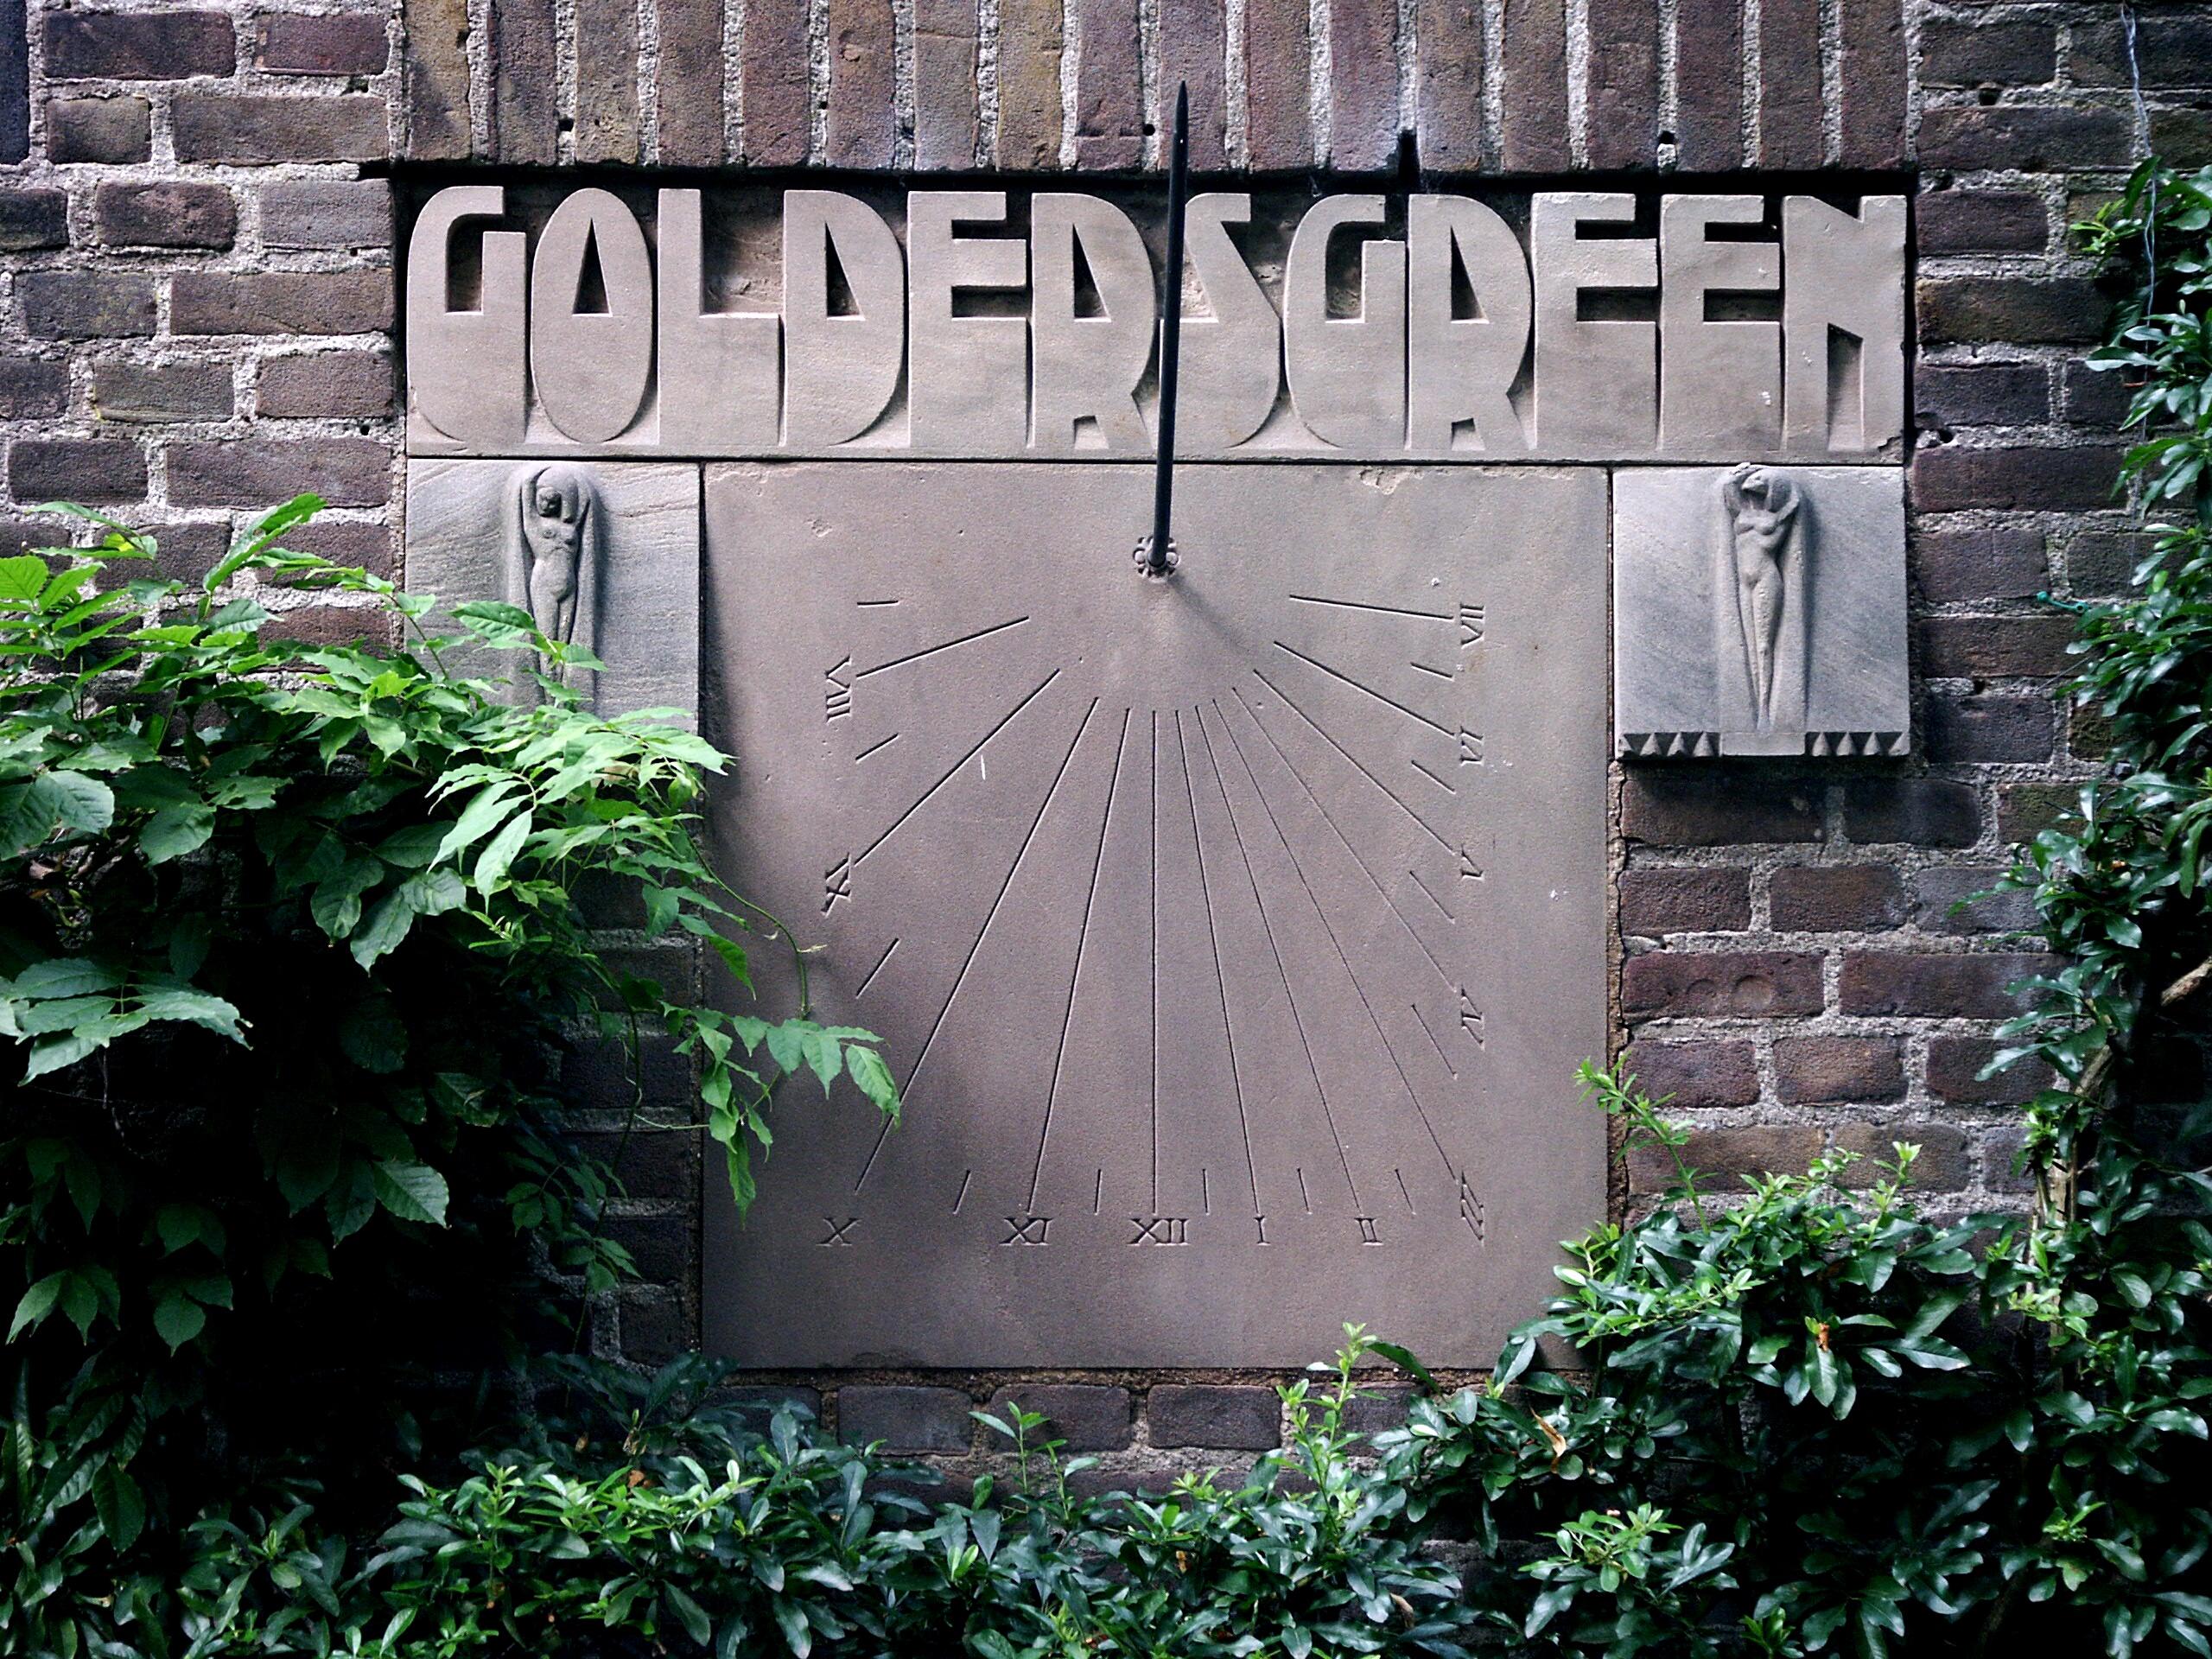 goldersgreen.JPG